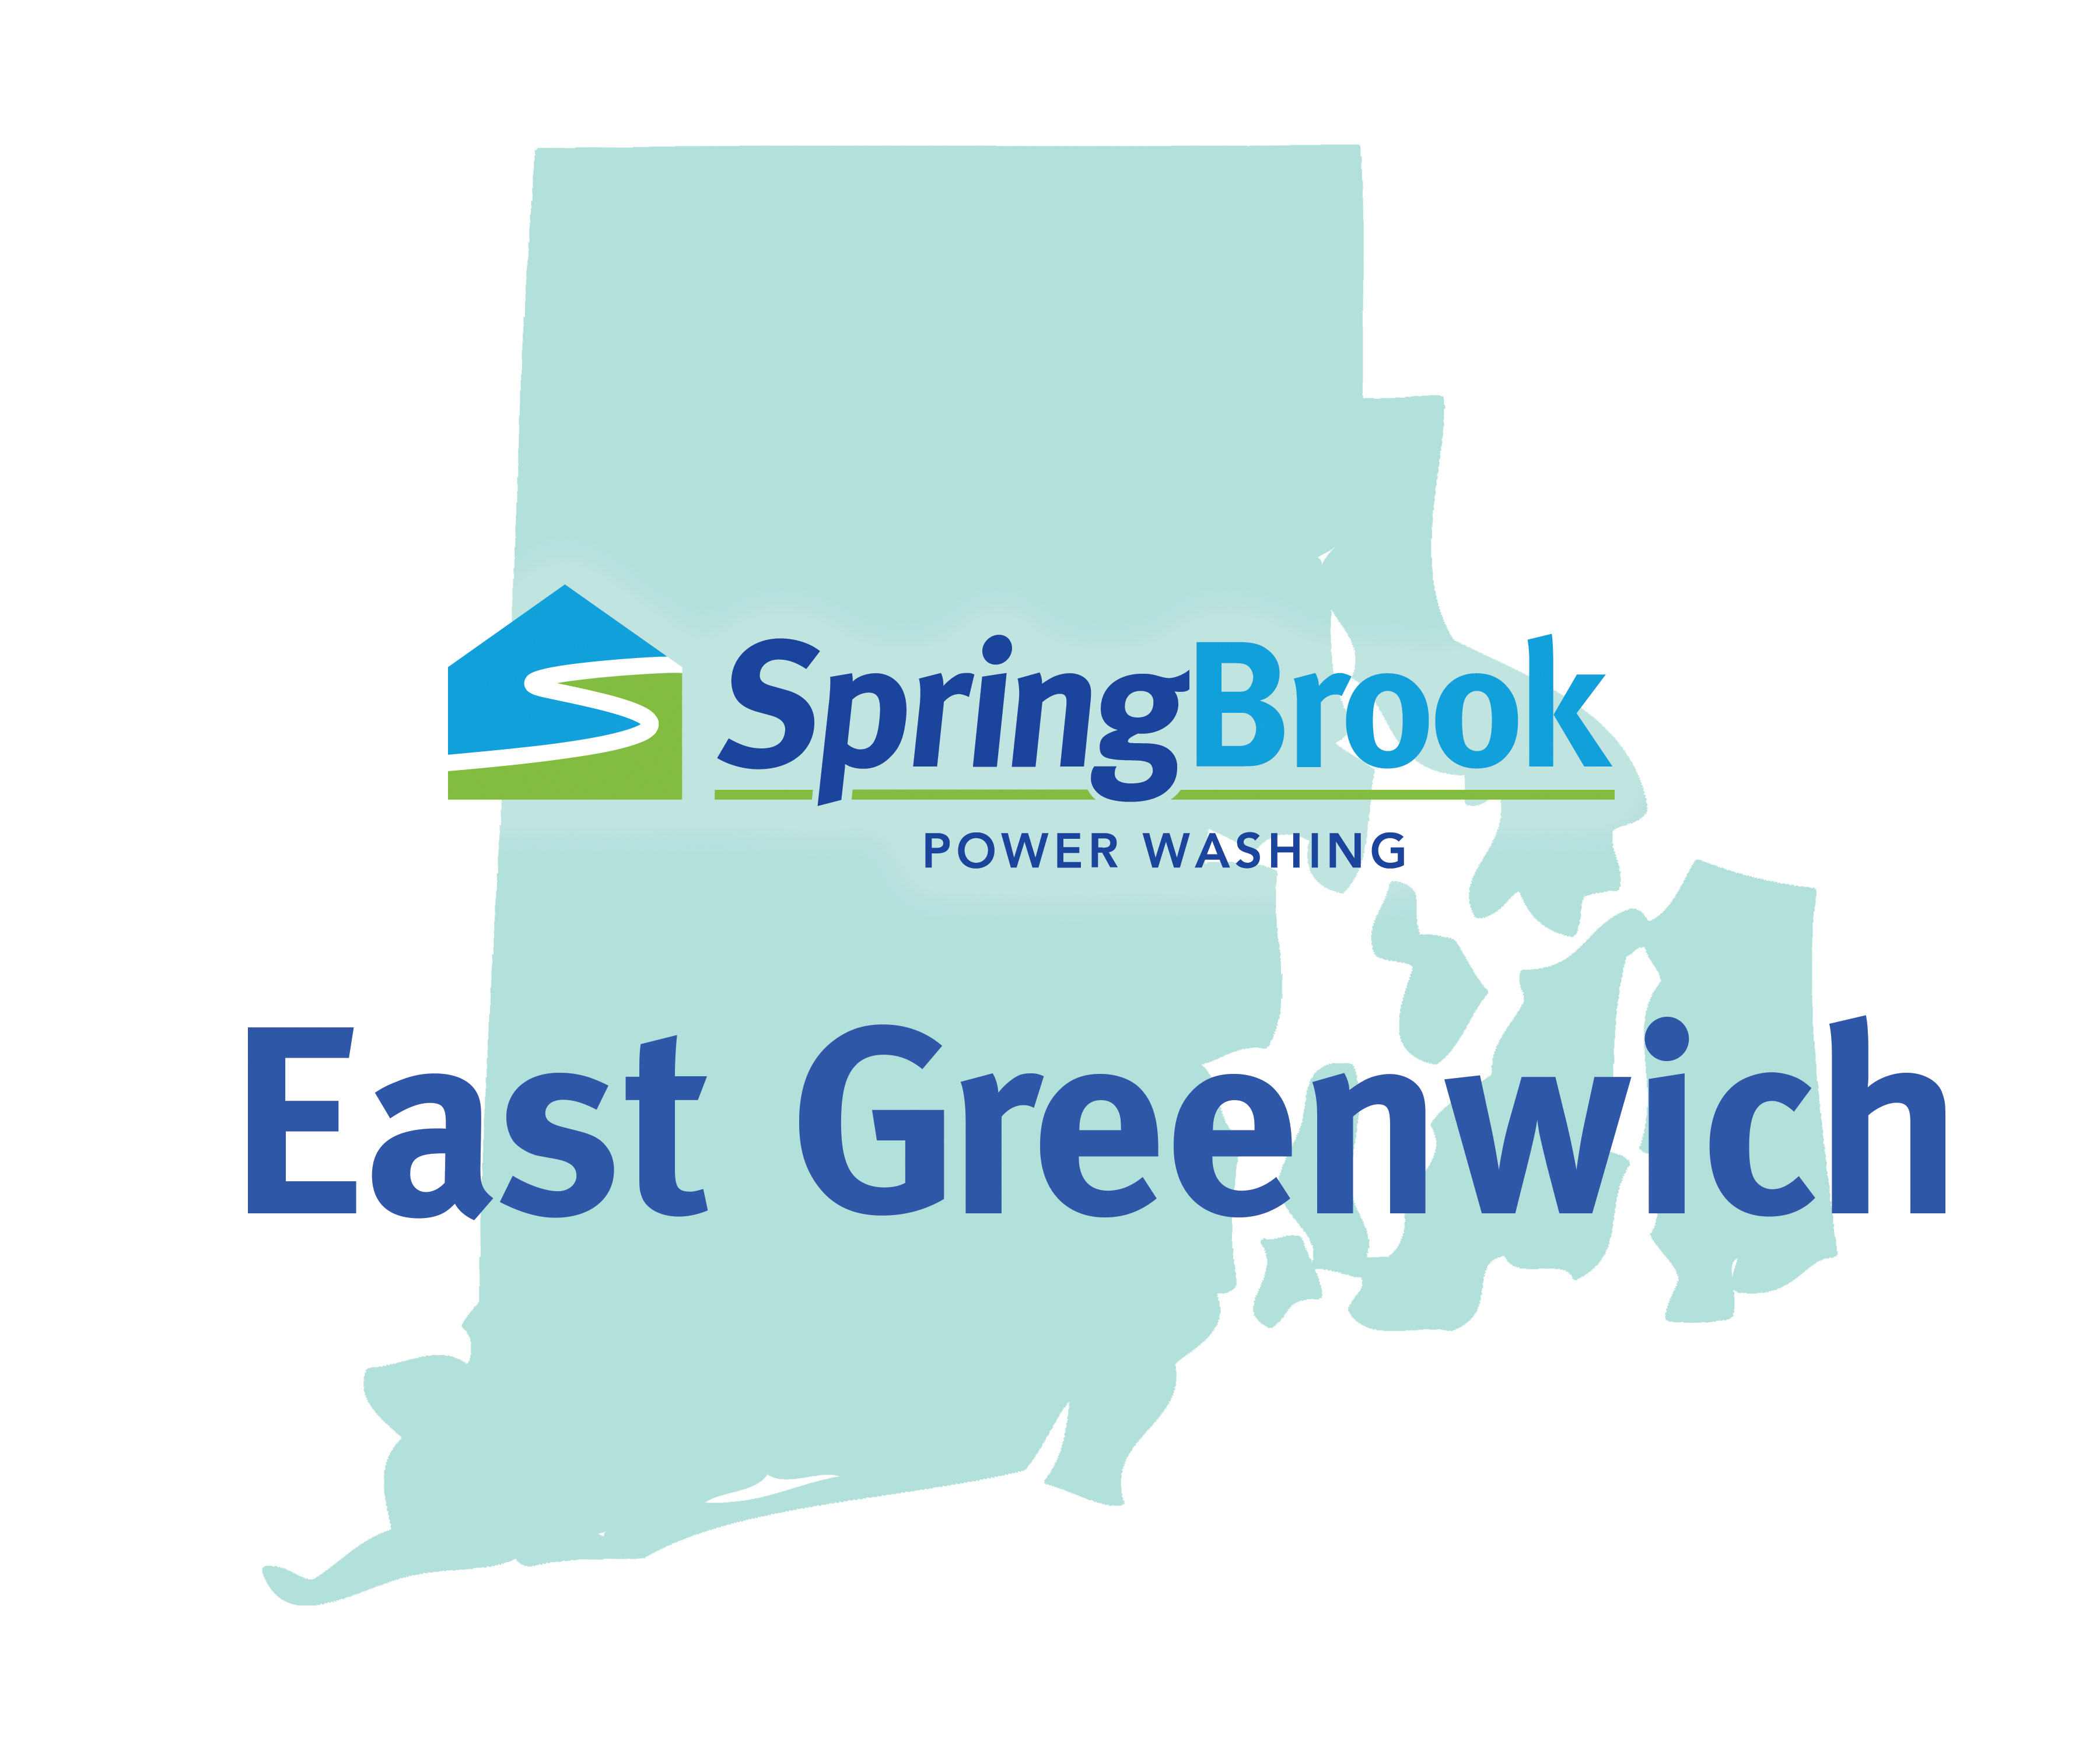 Springbrook Power Washing East Greenwich Rhode Island